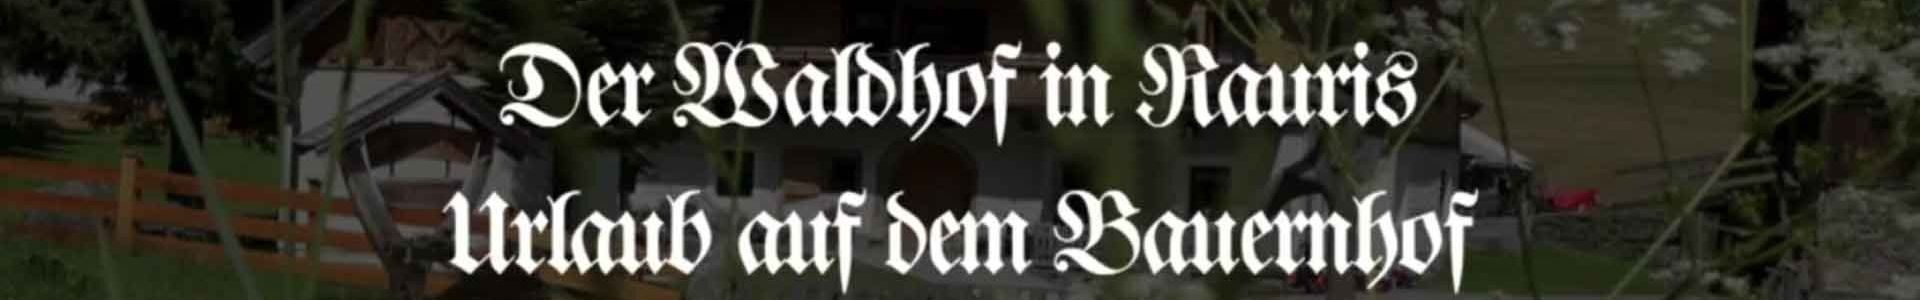 Waldhof Video